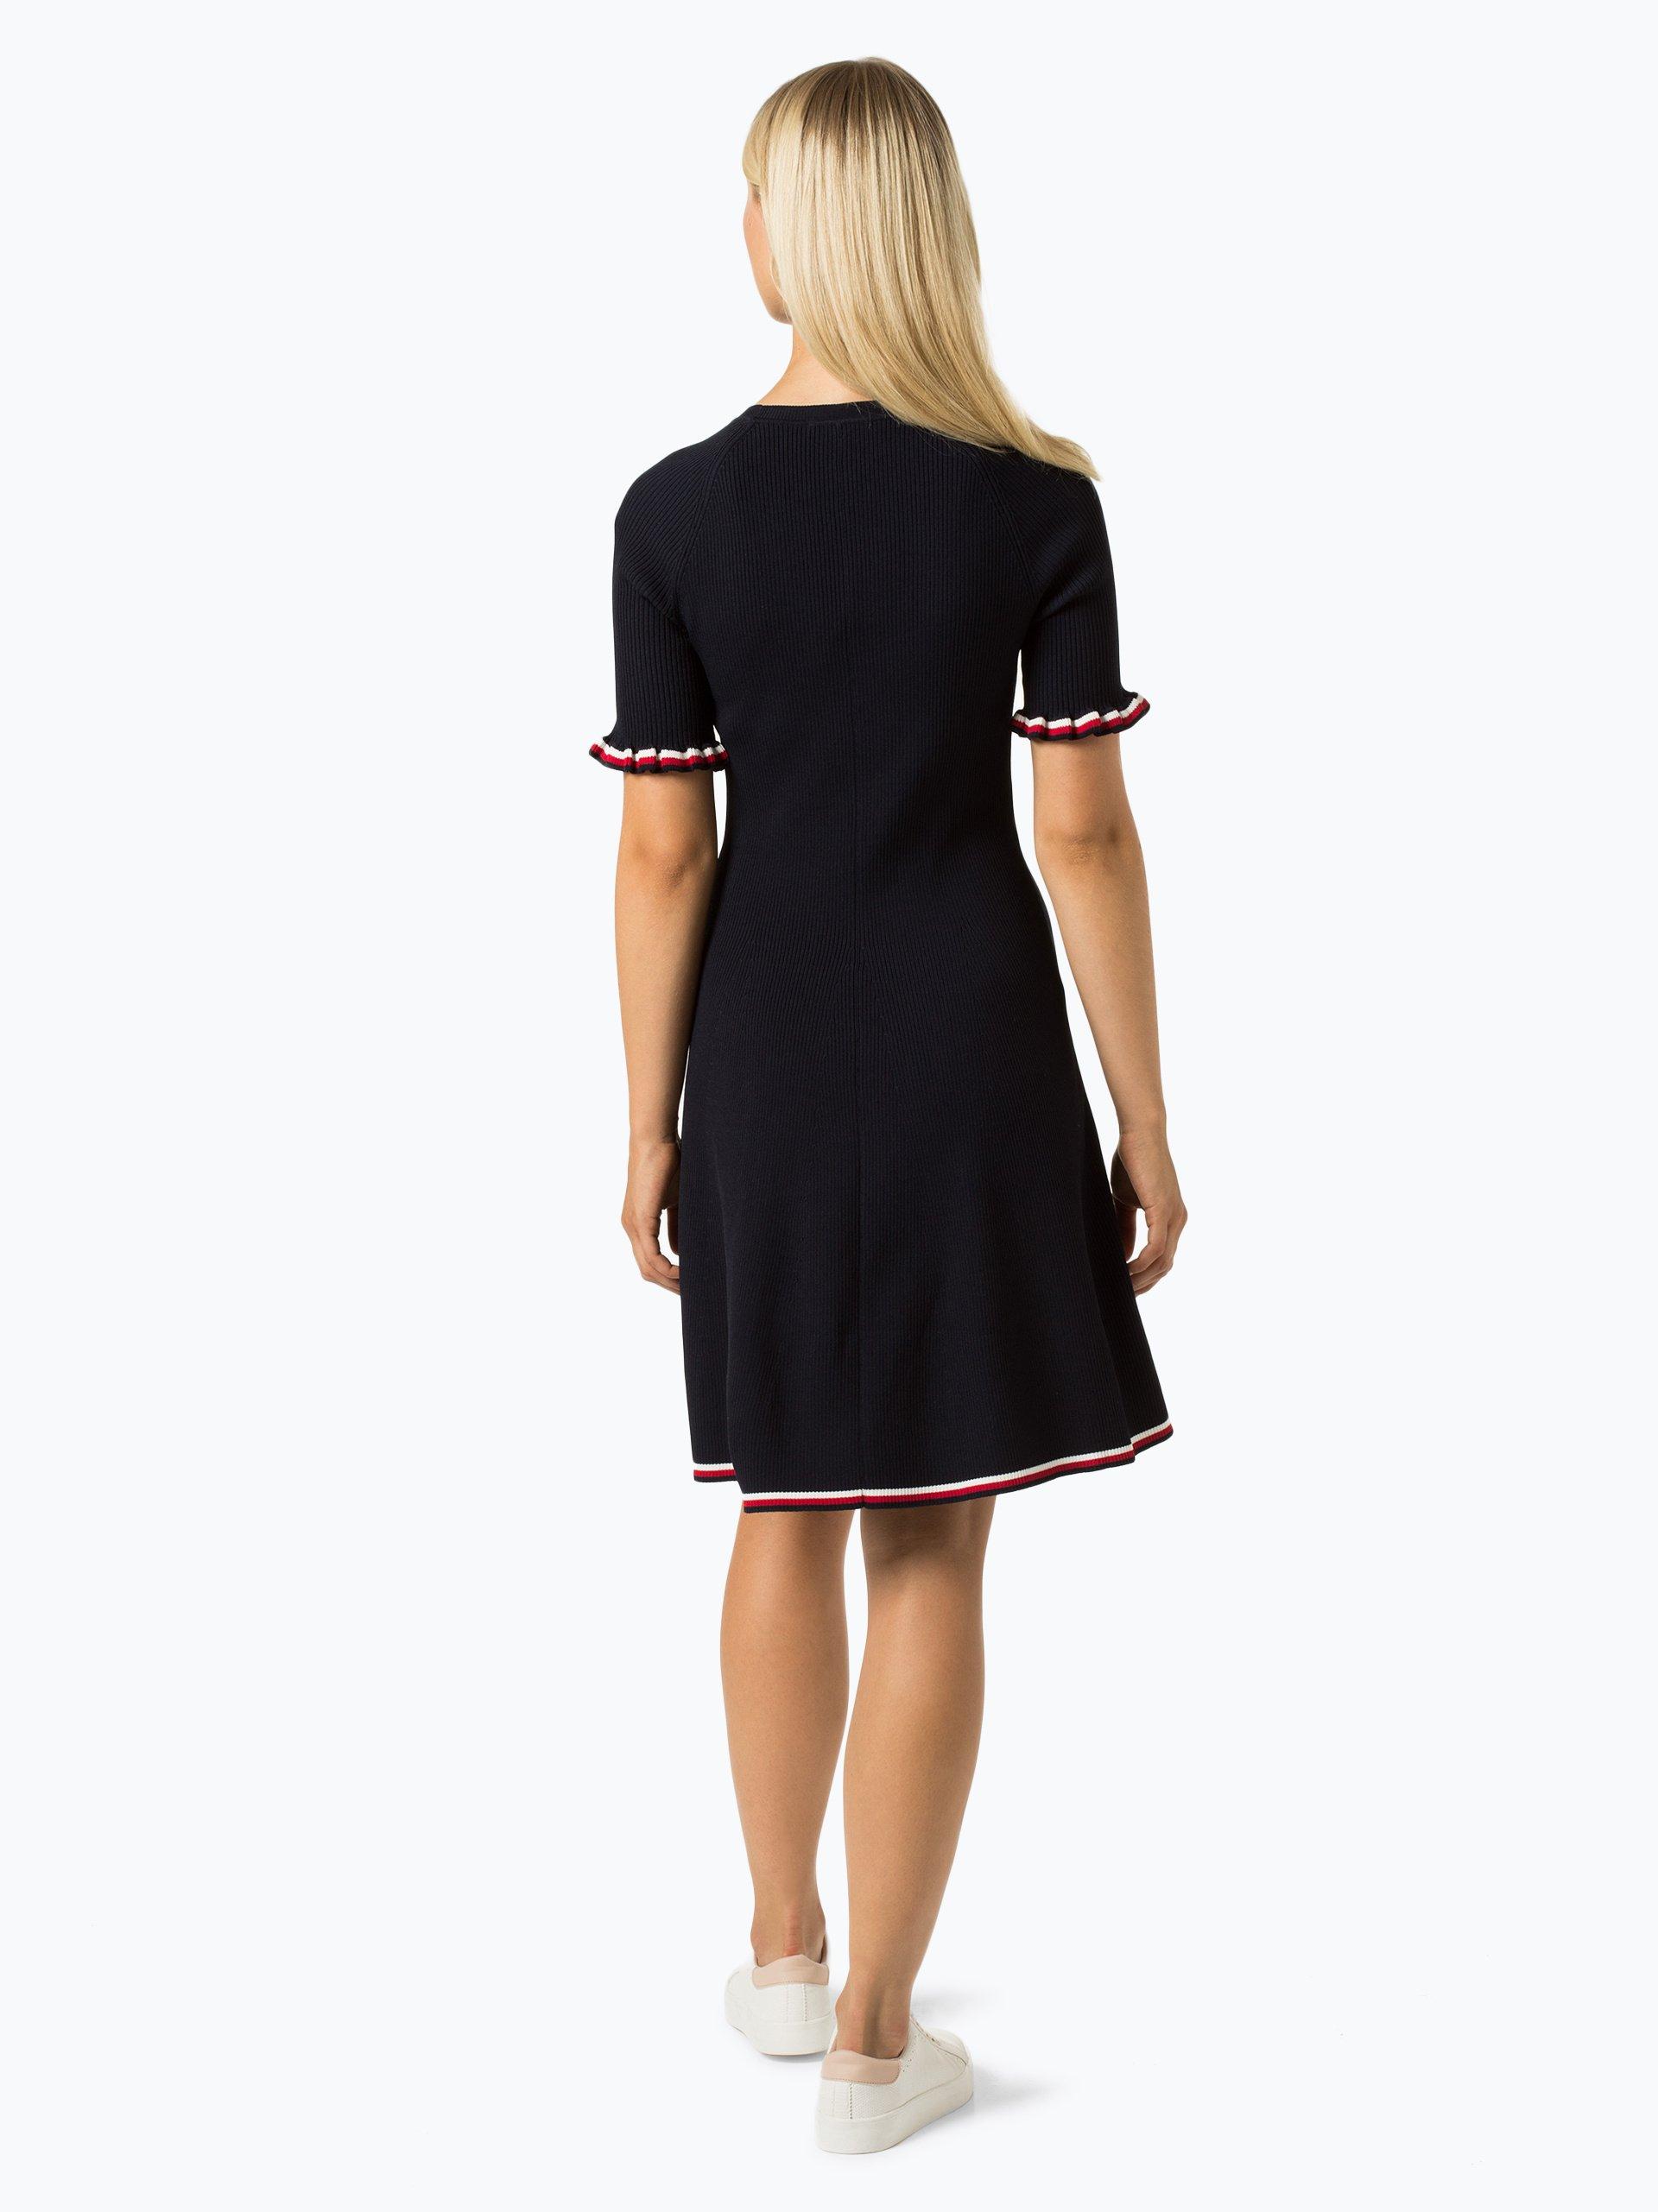 Tommy Hilfiger Damen Kleid online kaufen | VANGRAAF.COM